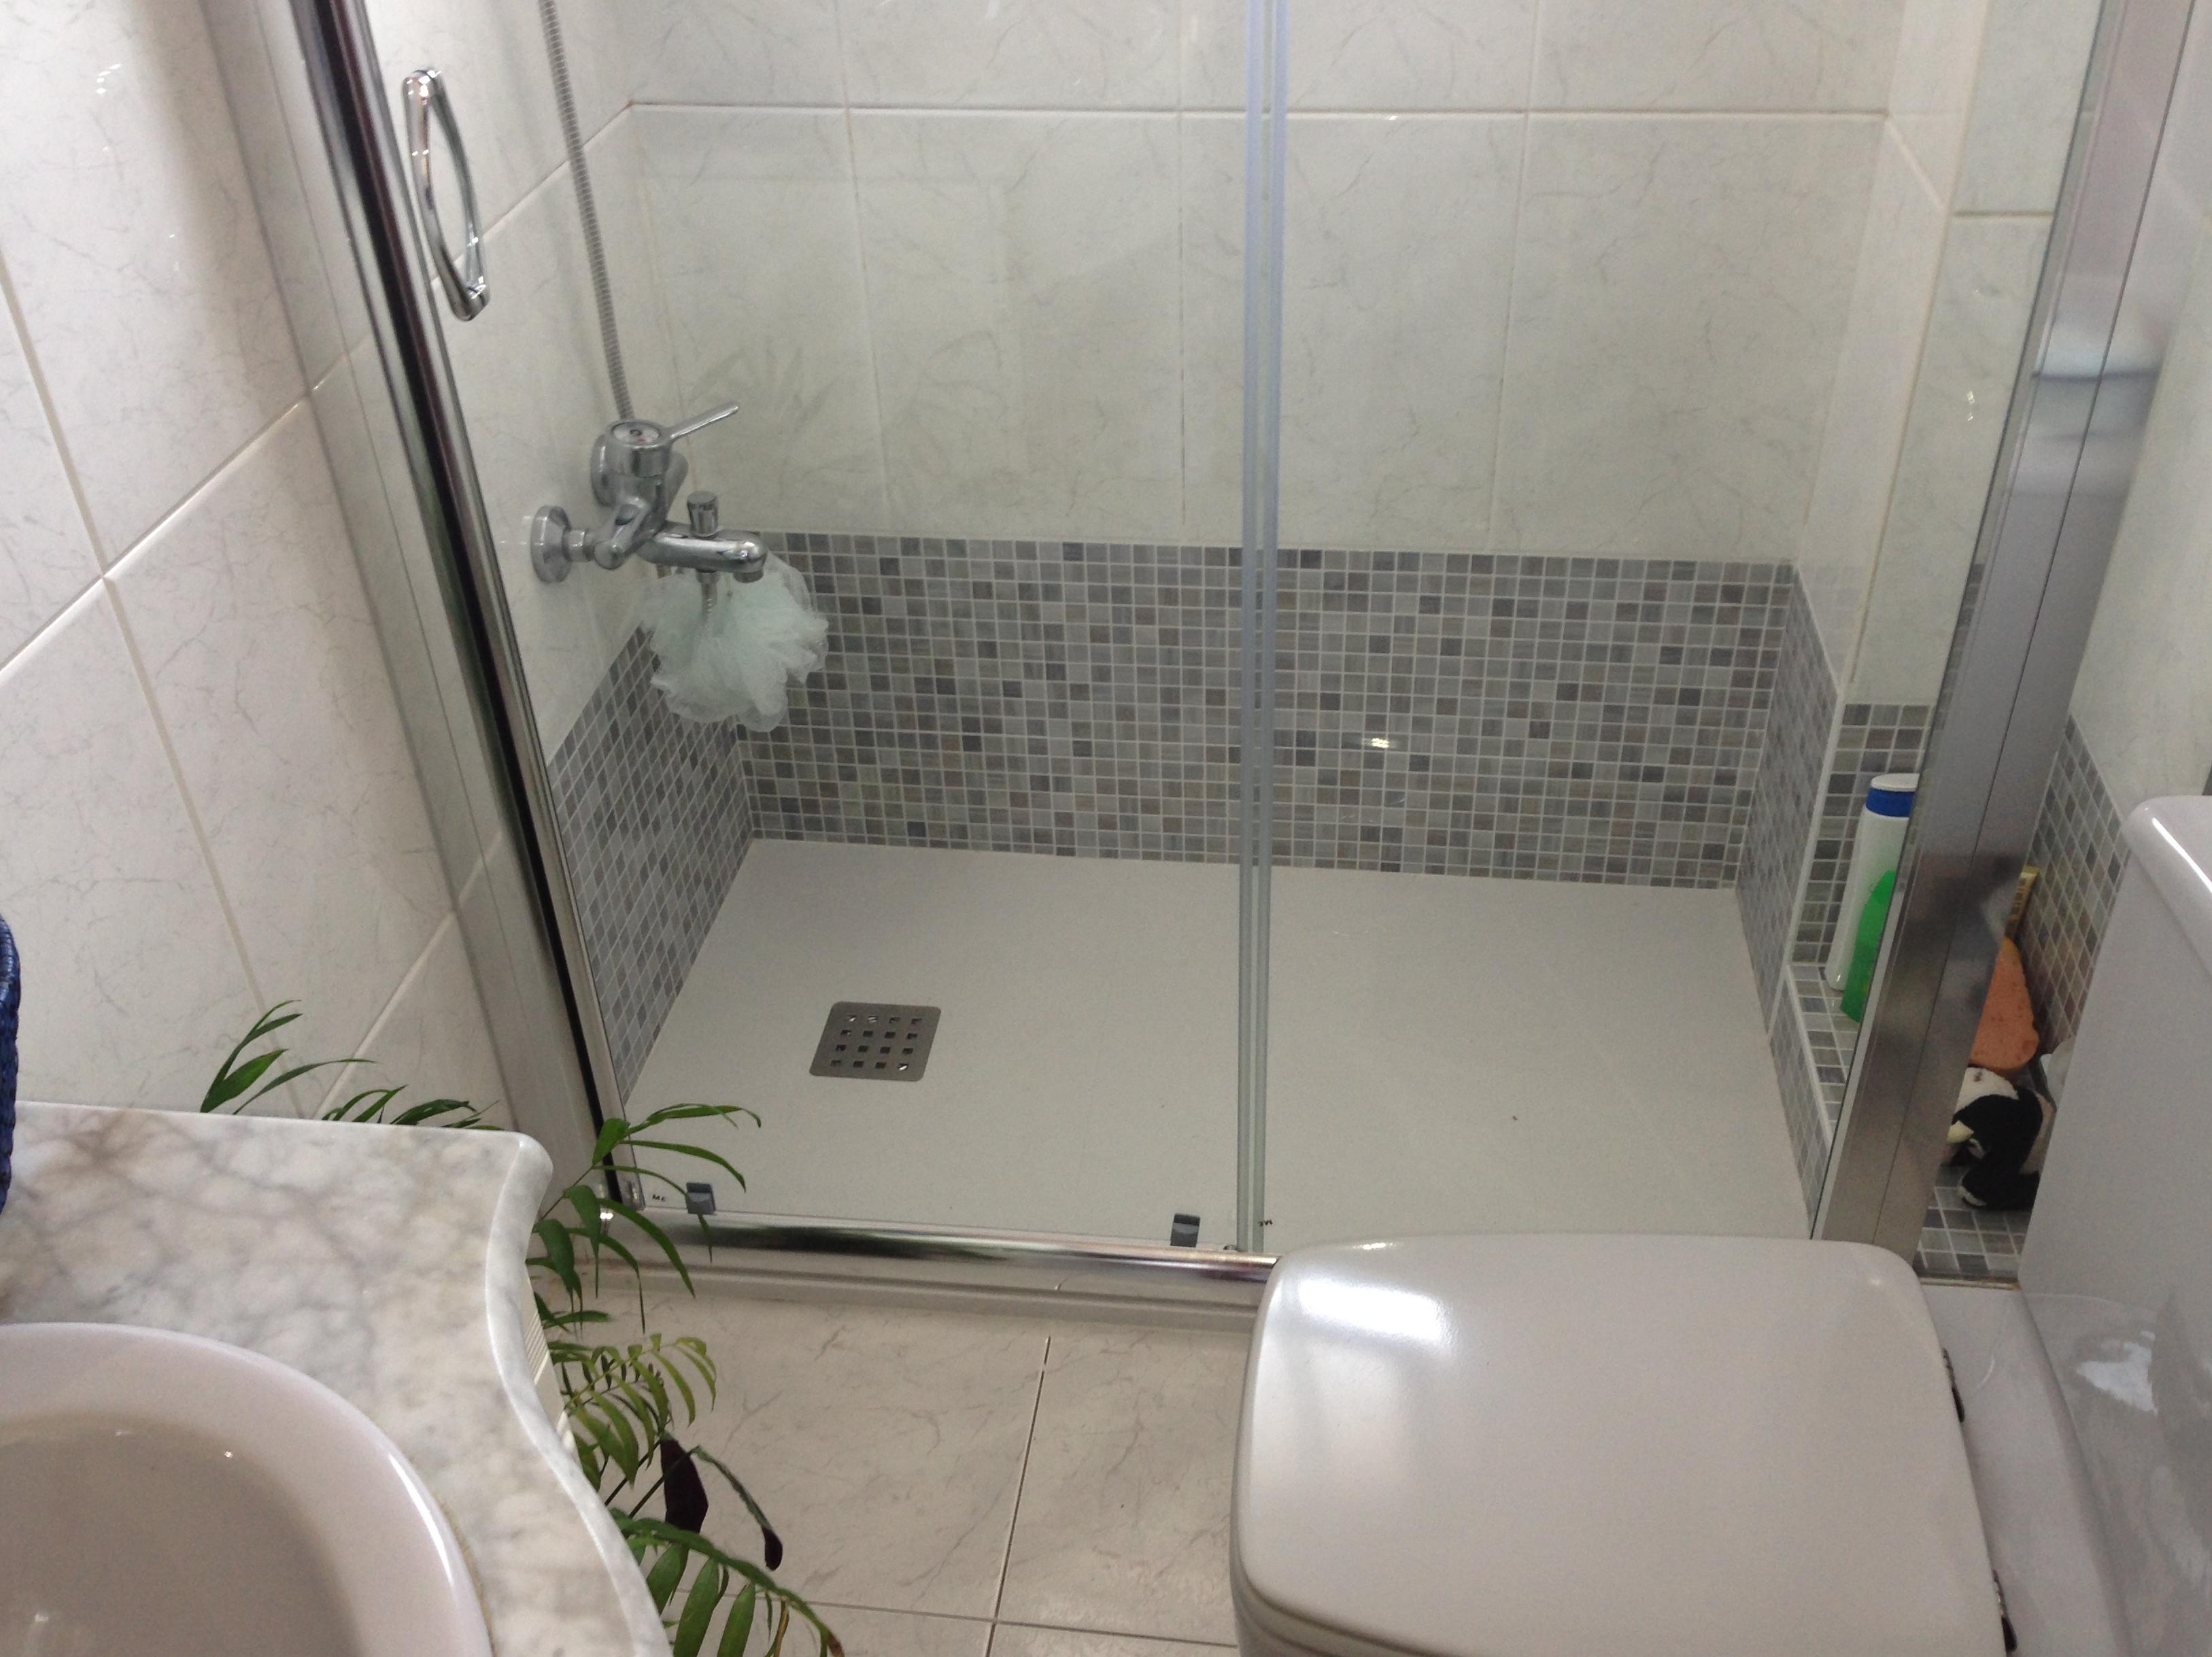 Reforma Baño Banera Por Ducha:reforma-ducha-bañera